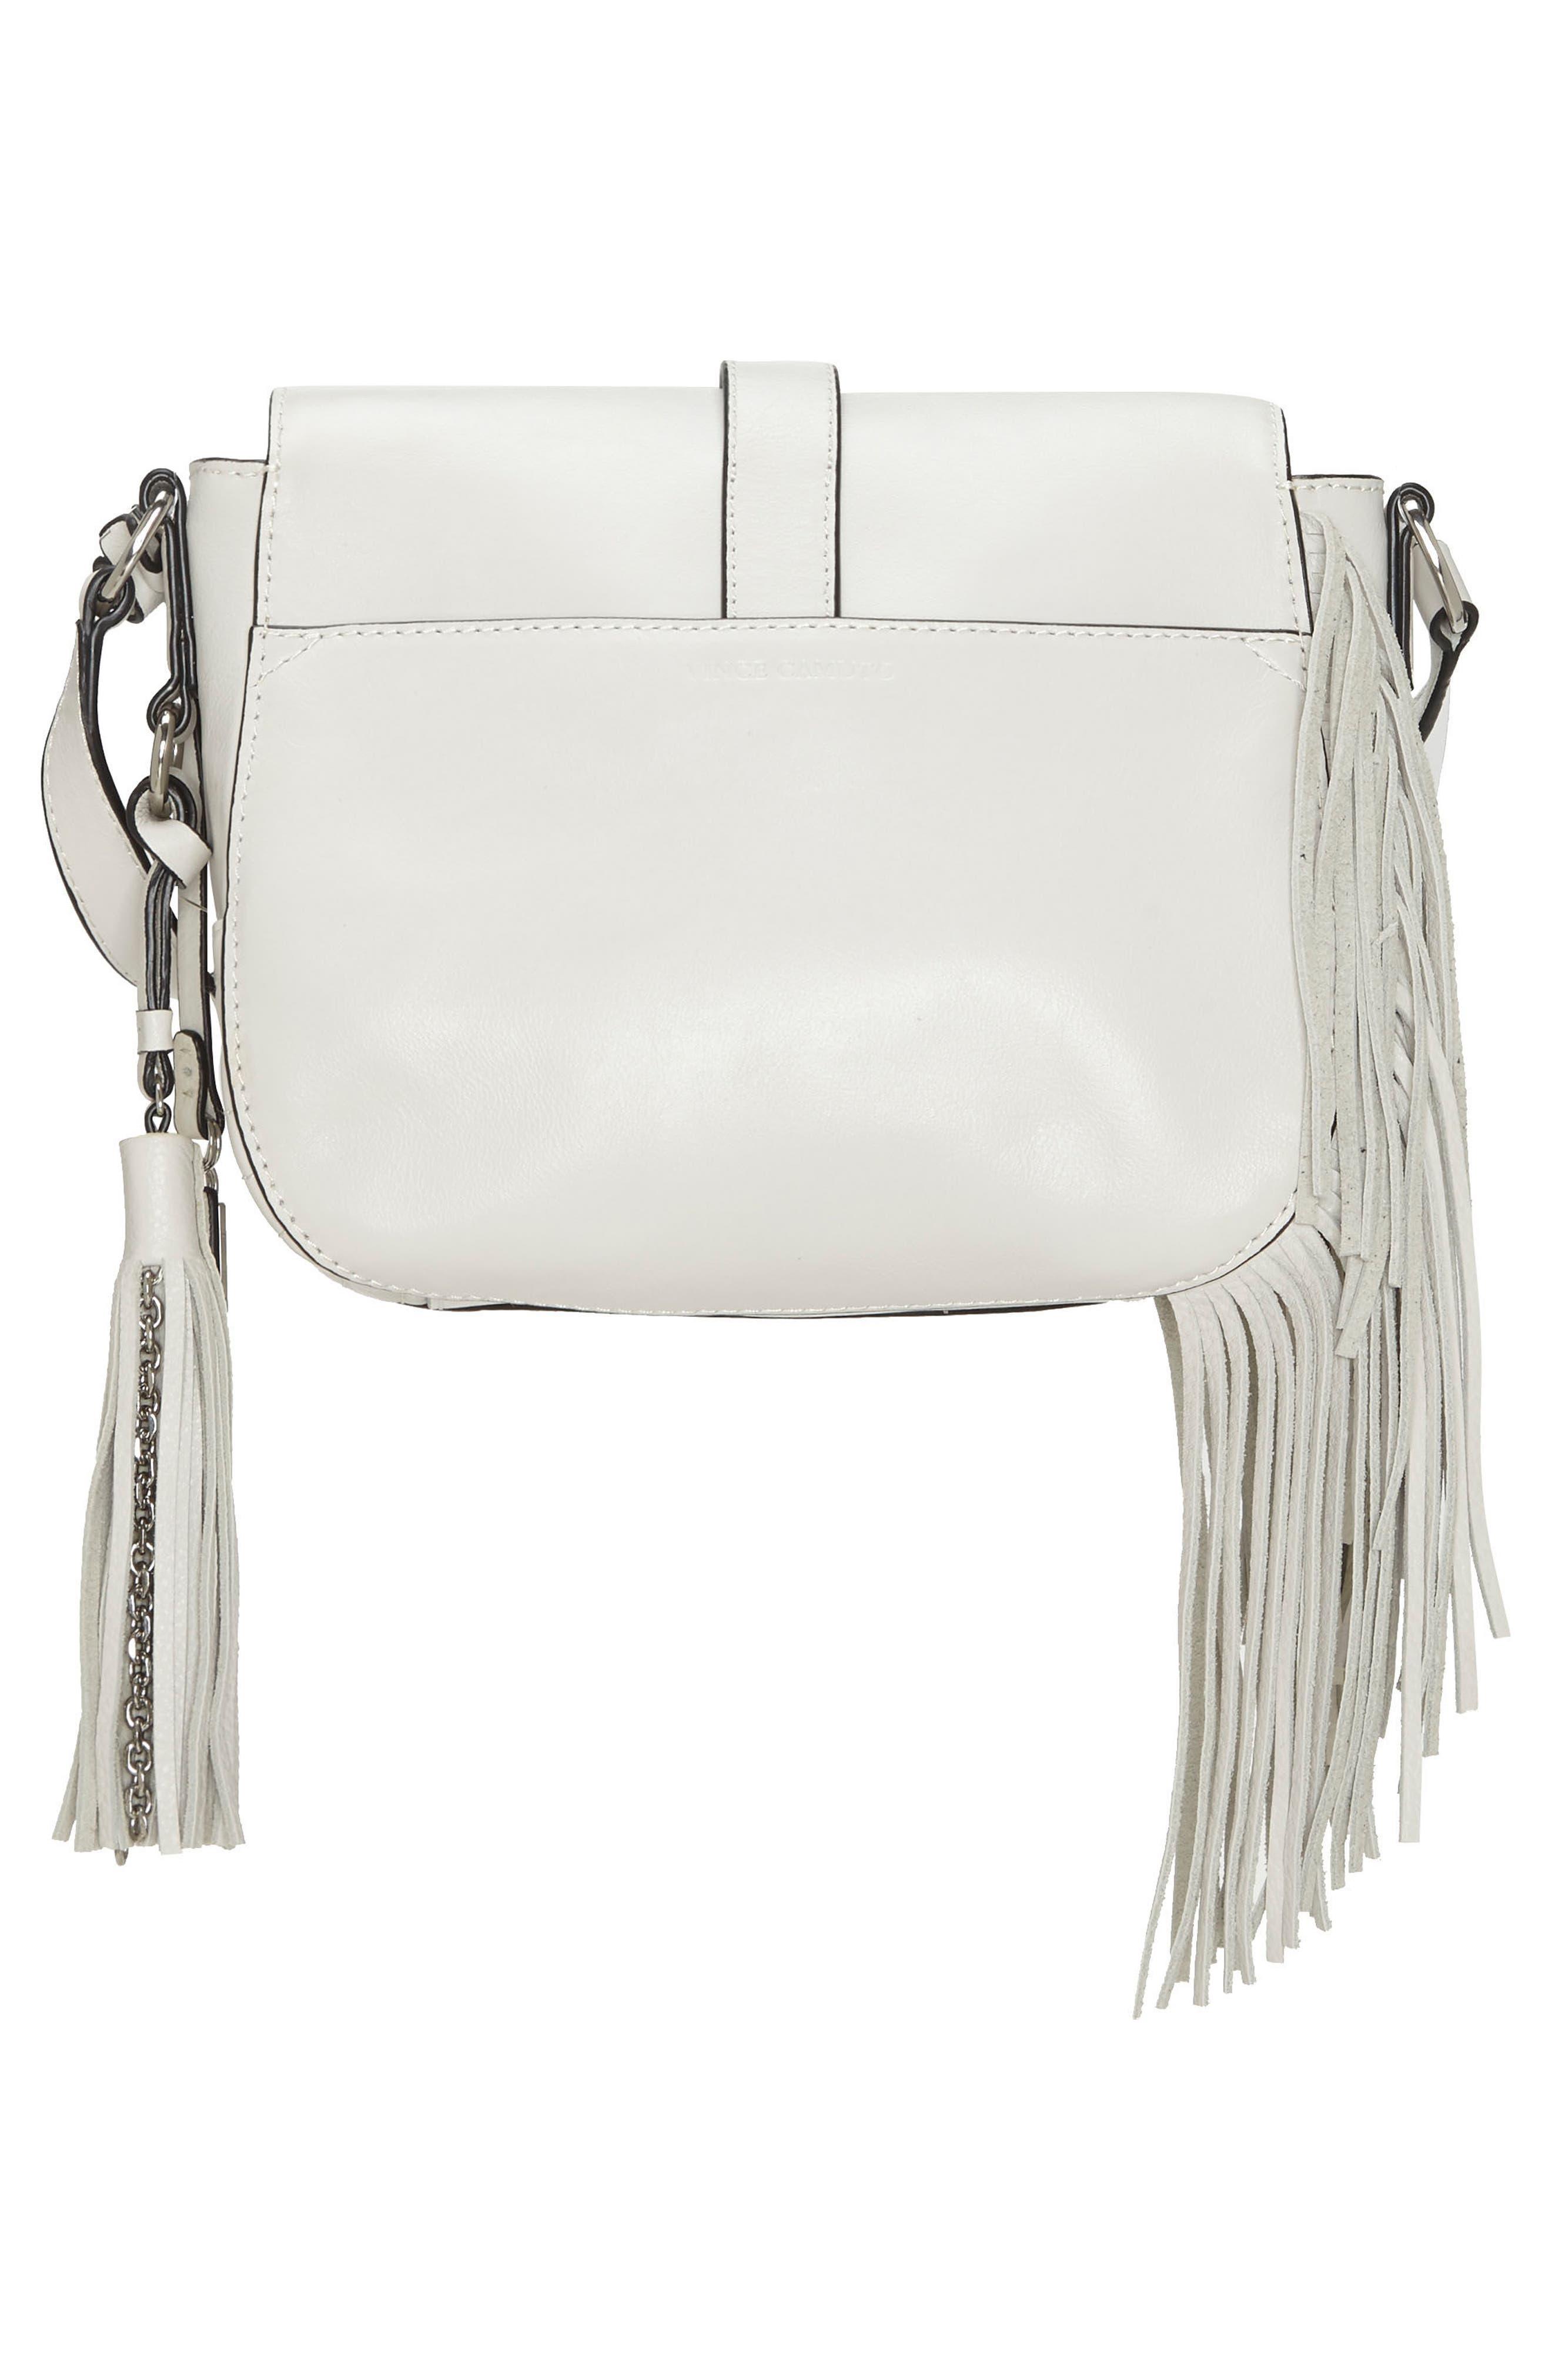 Hil Leather Crossbody Bag,                             Alternate thumbnail 2, color,                             Vaporous Grey